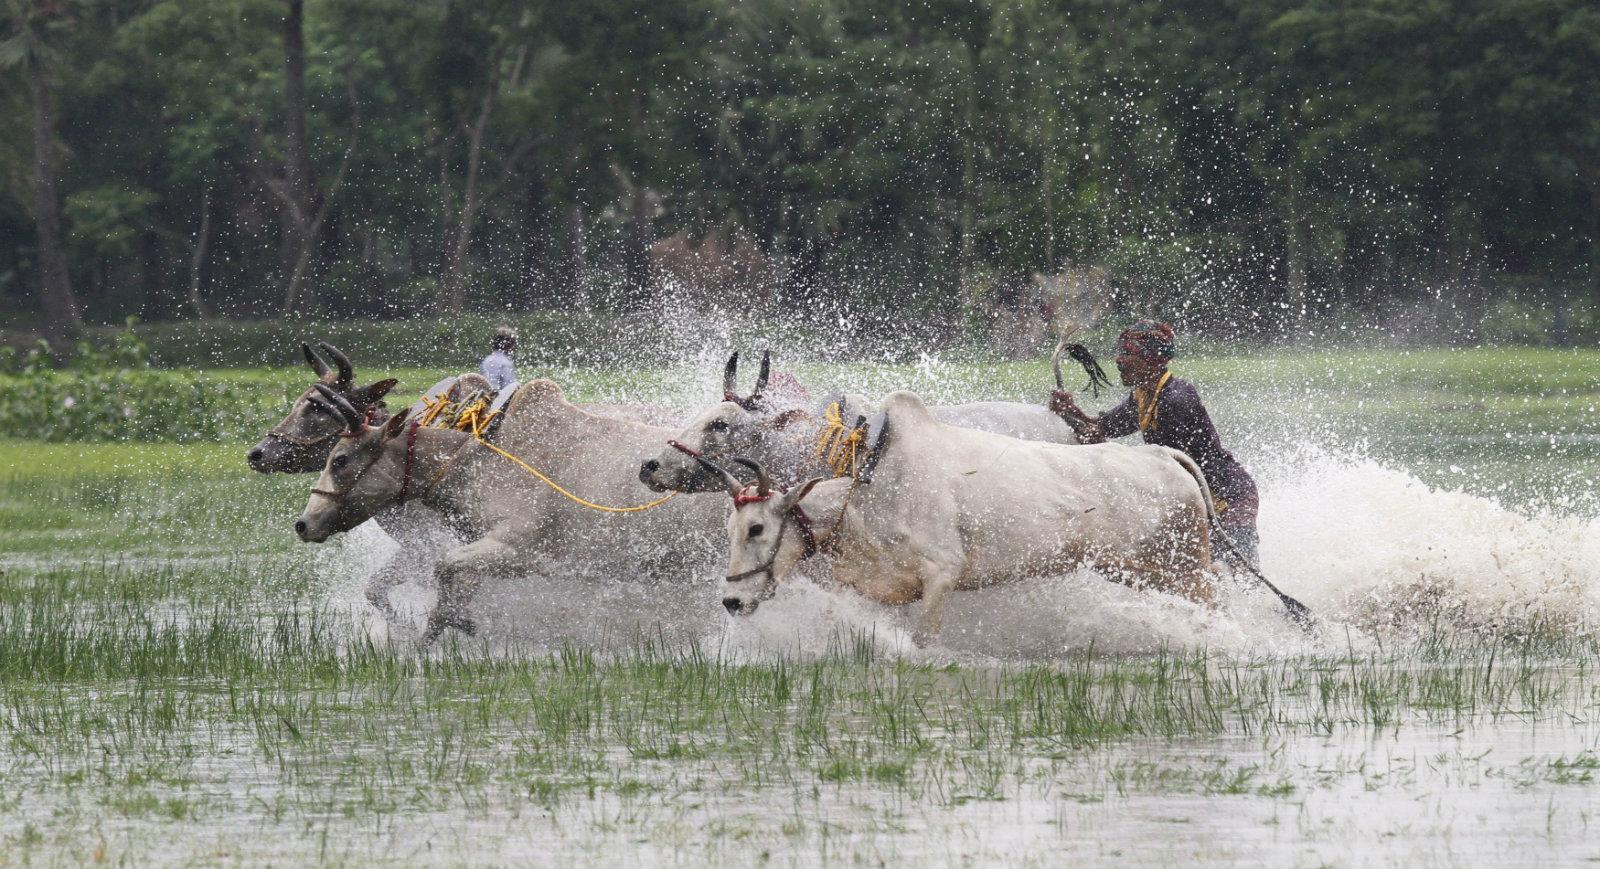 India-vegetarianism-livestock-farmers